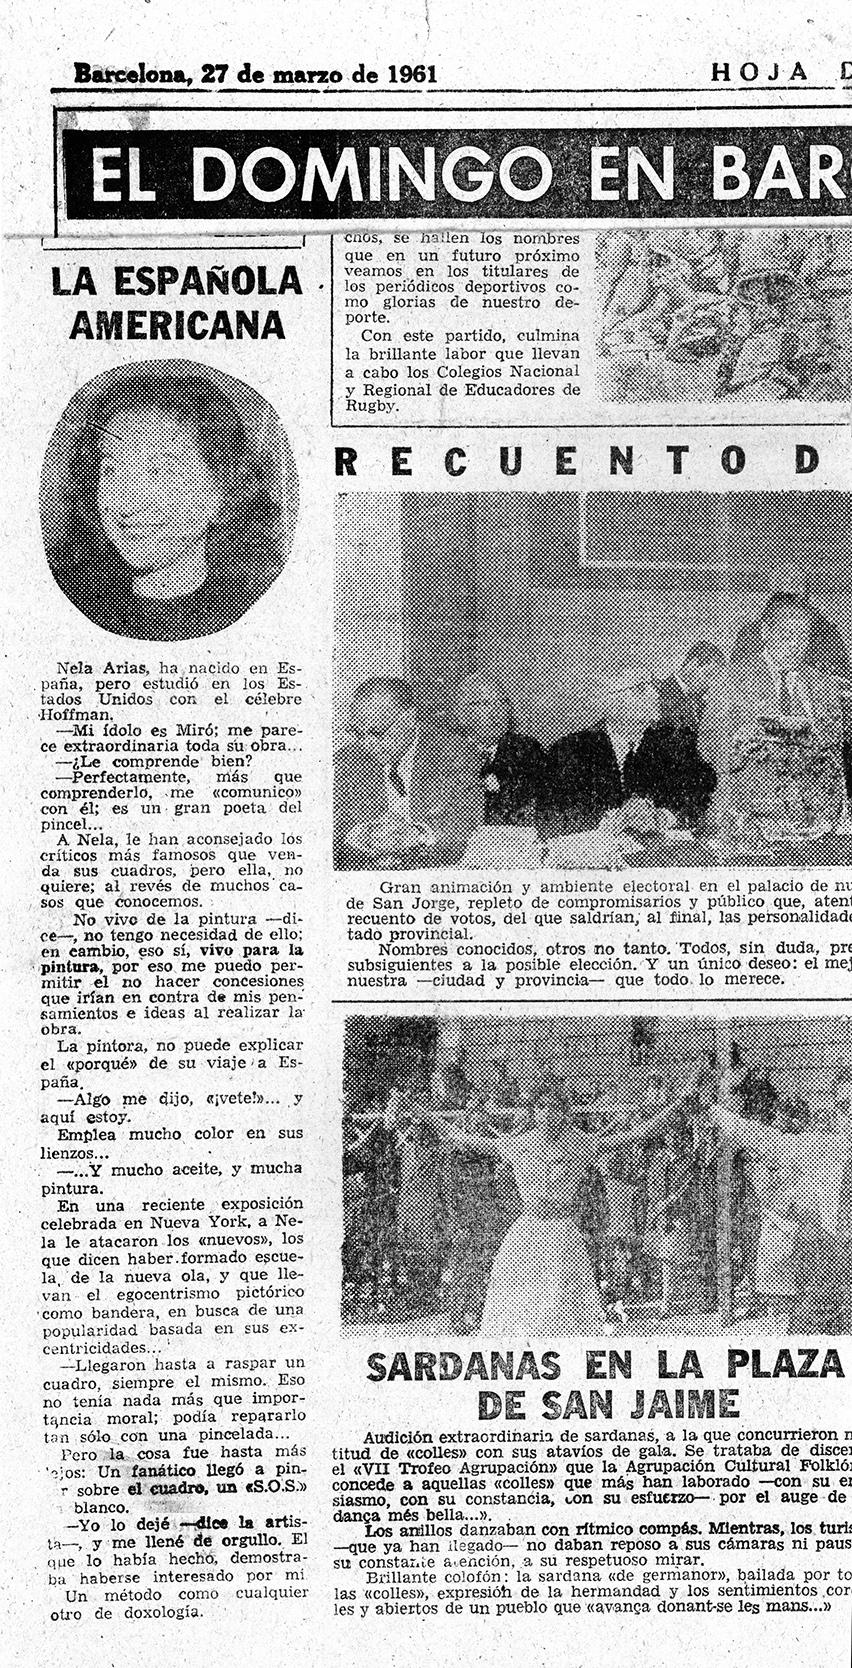 NOT FOR SALE - Nela Arias-Misson  Barcelona interview - Hoja del Lunes - March 27, 1961